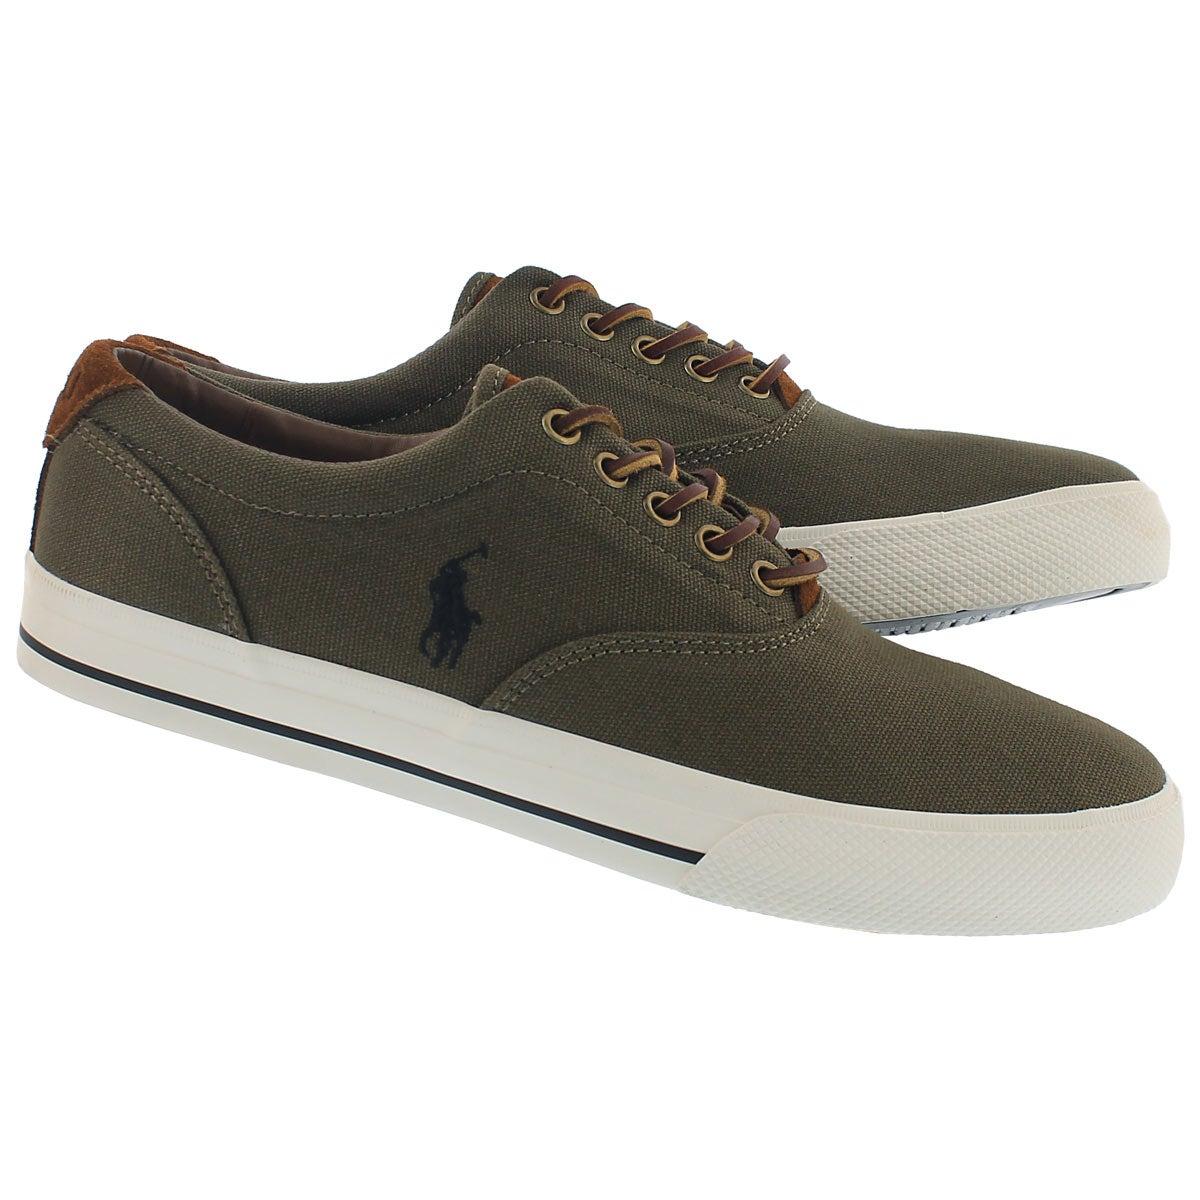 Mns Vaughn algae cnvs/sde sneaker